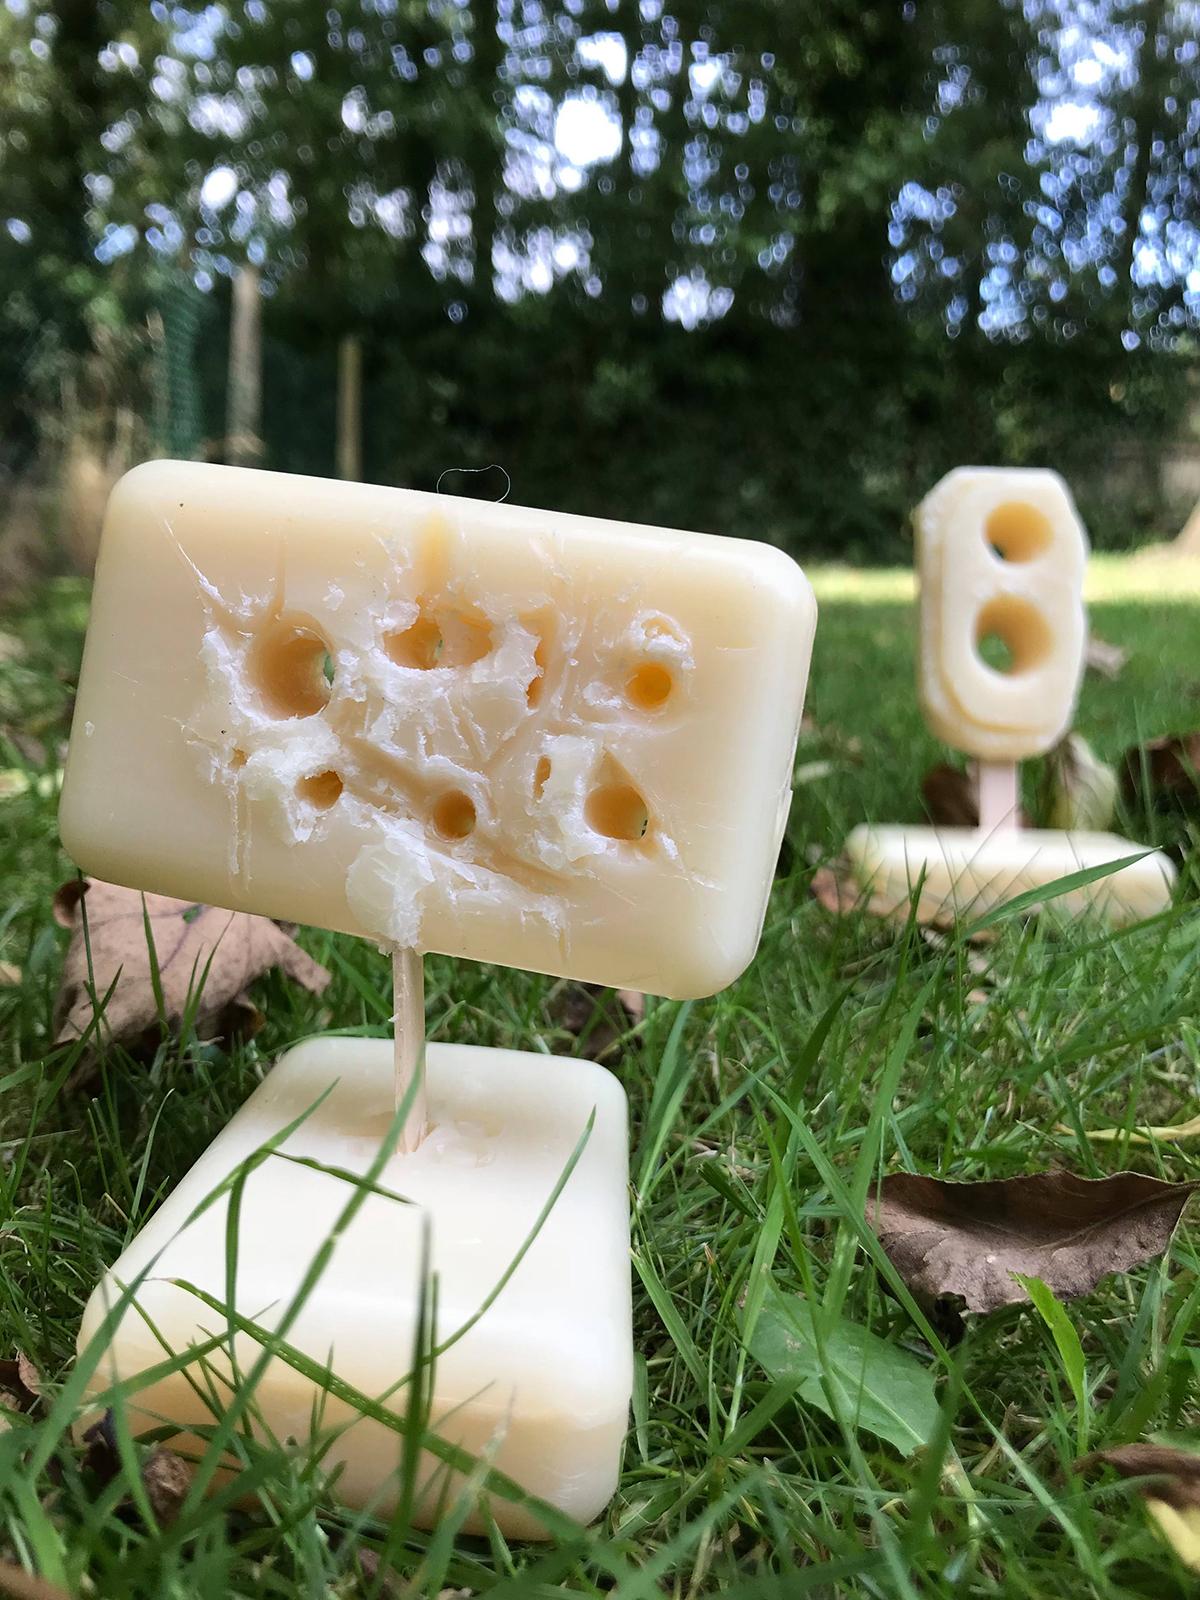 soap carving exploration